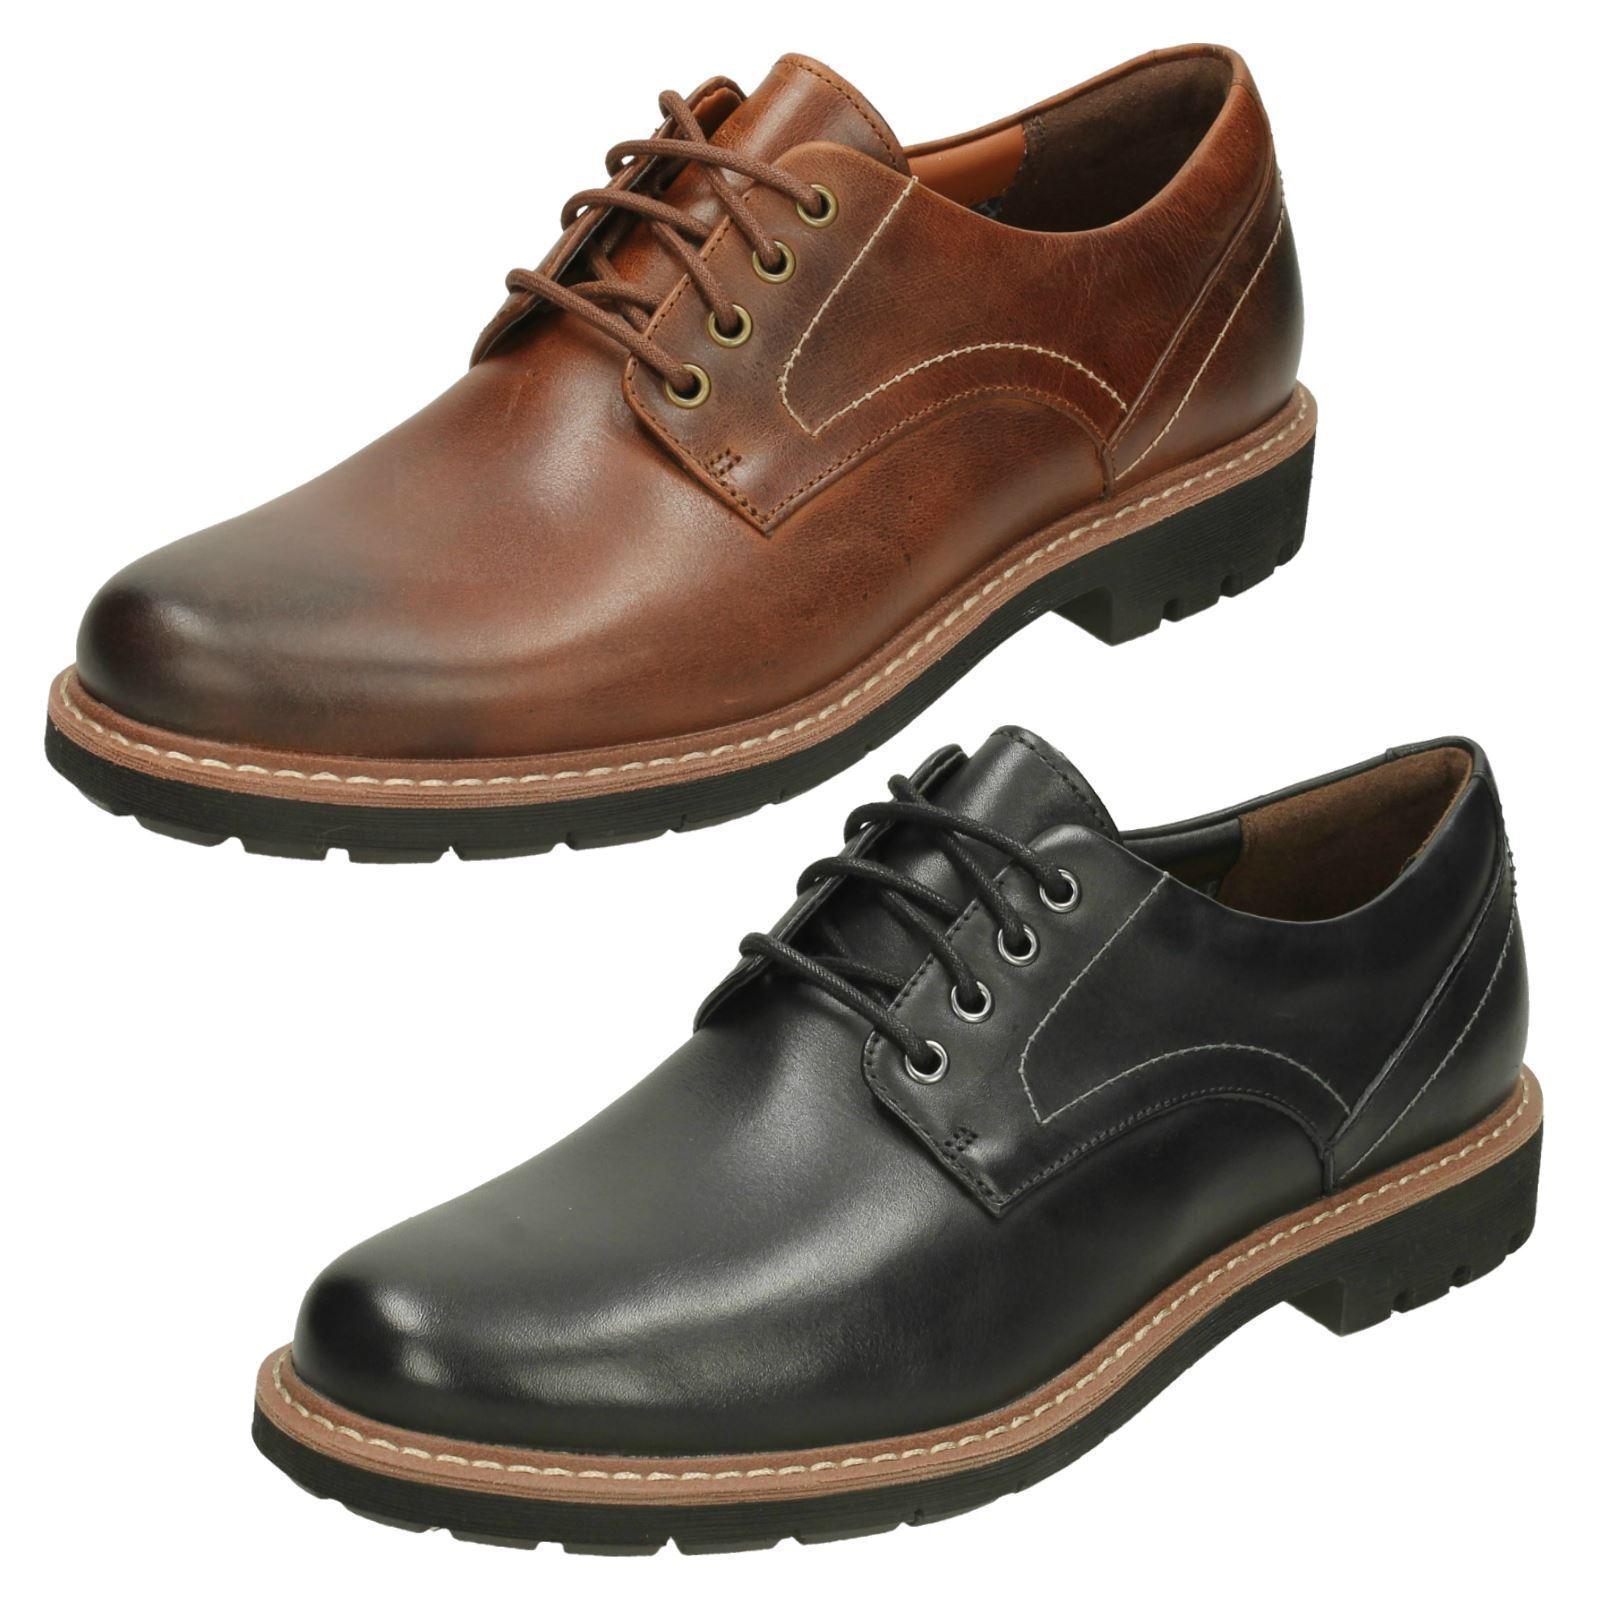 Mens Clarks Batcombe Hall Leather Smart